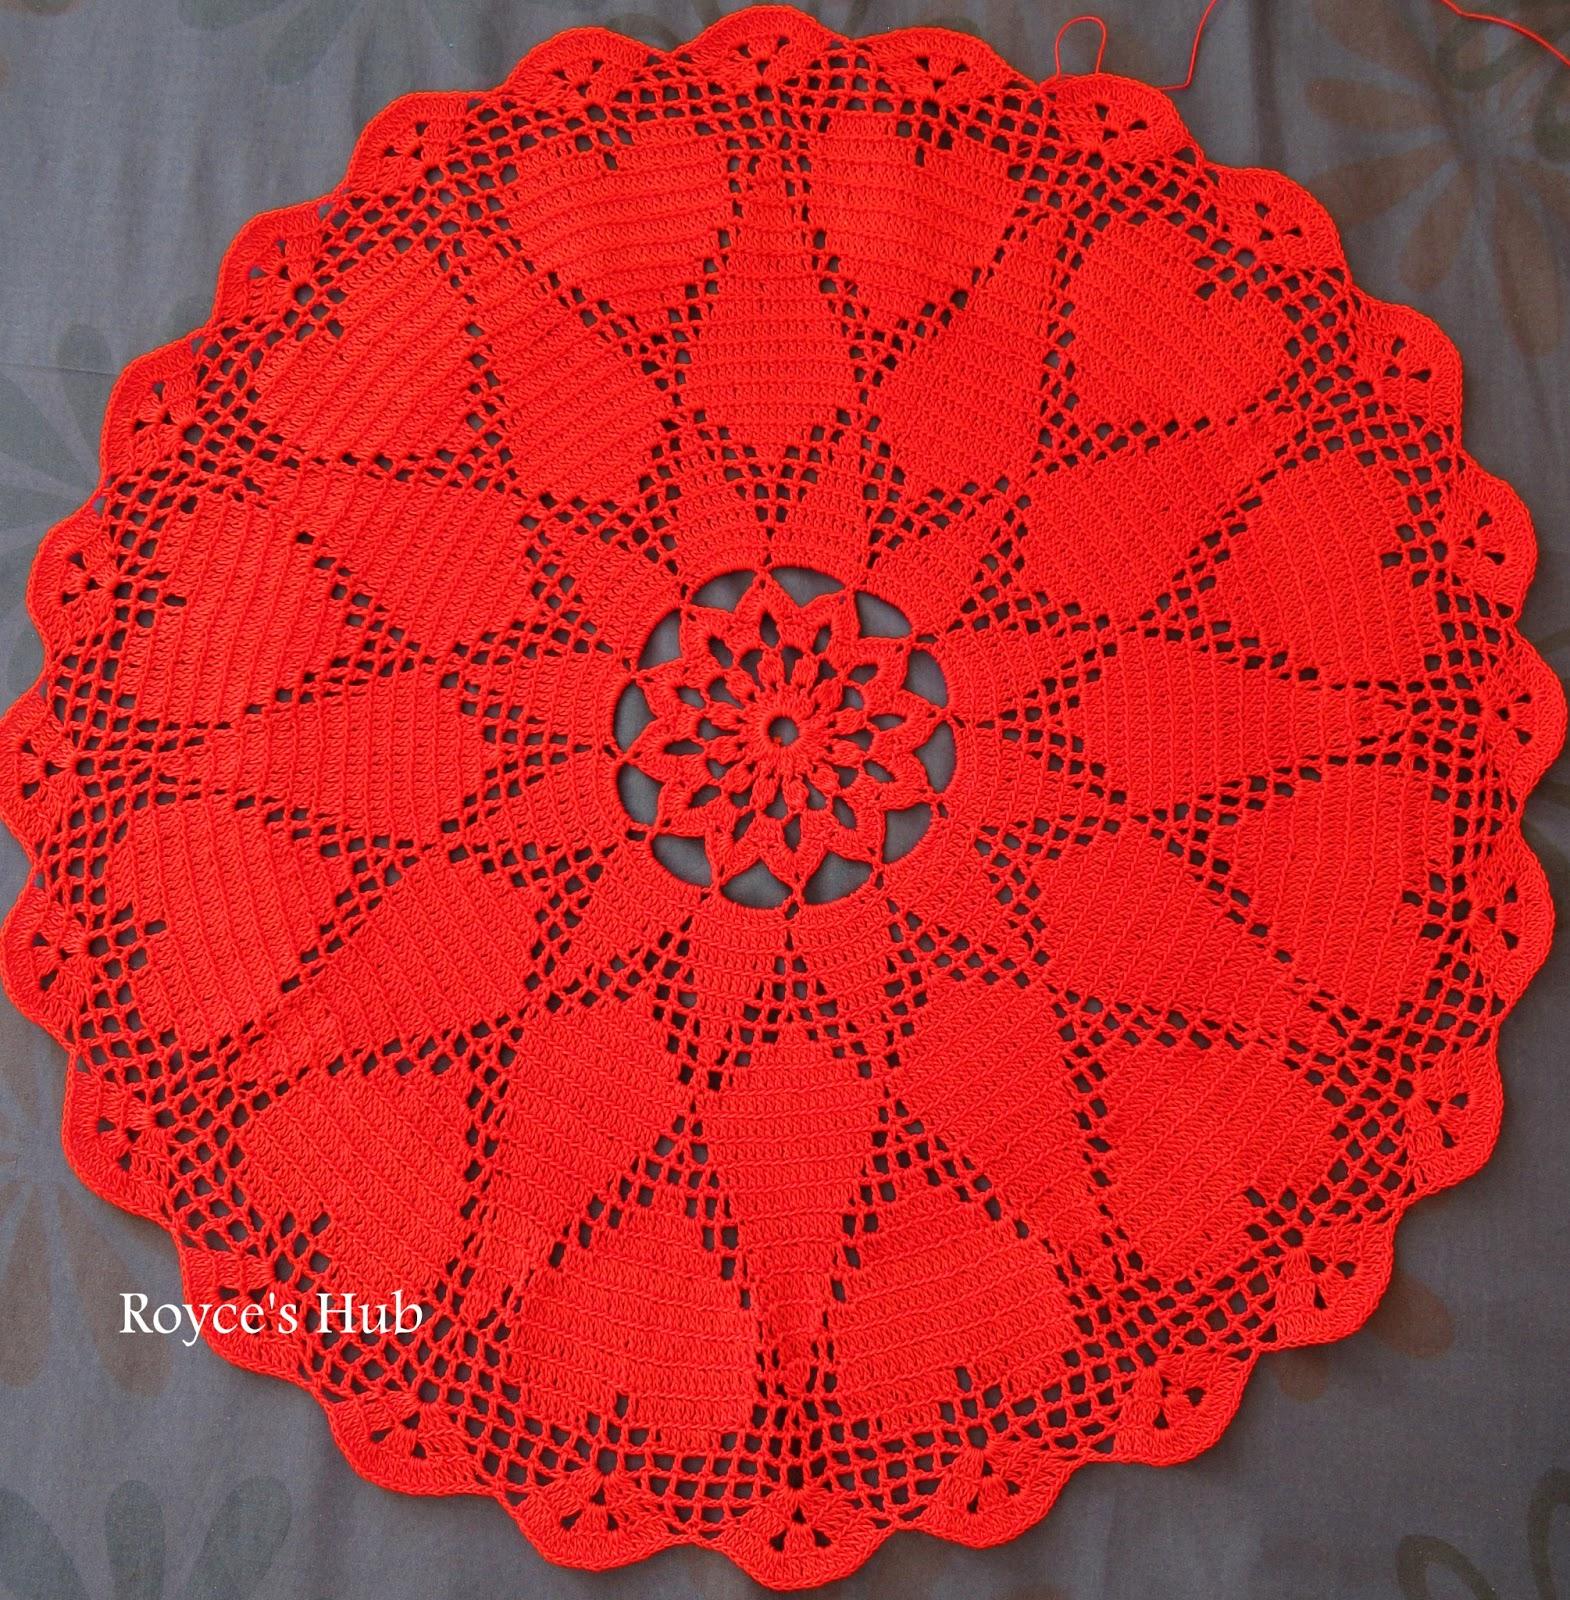 Royces Hub: Filet Crochet Heart Doily